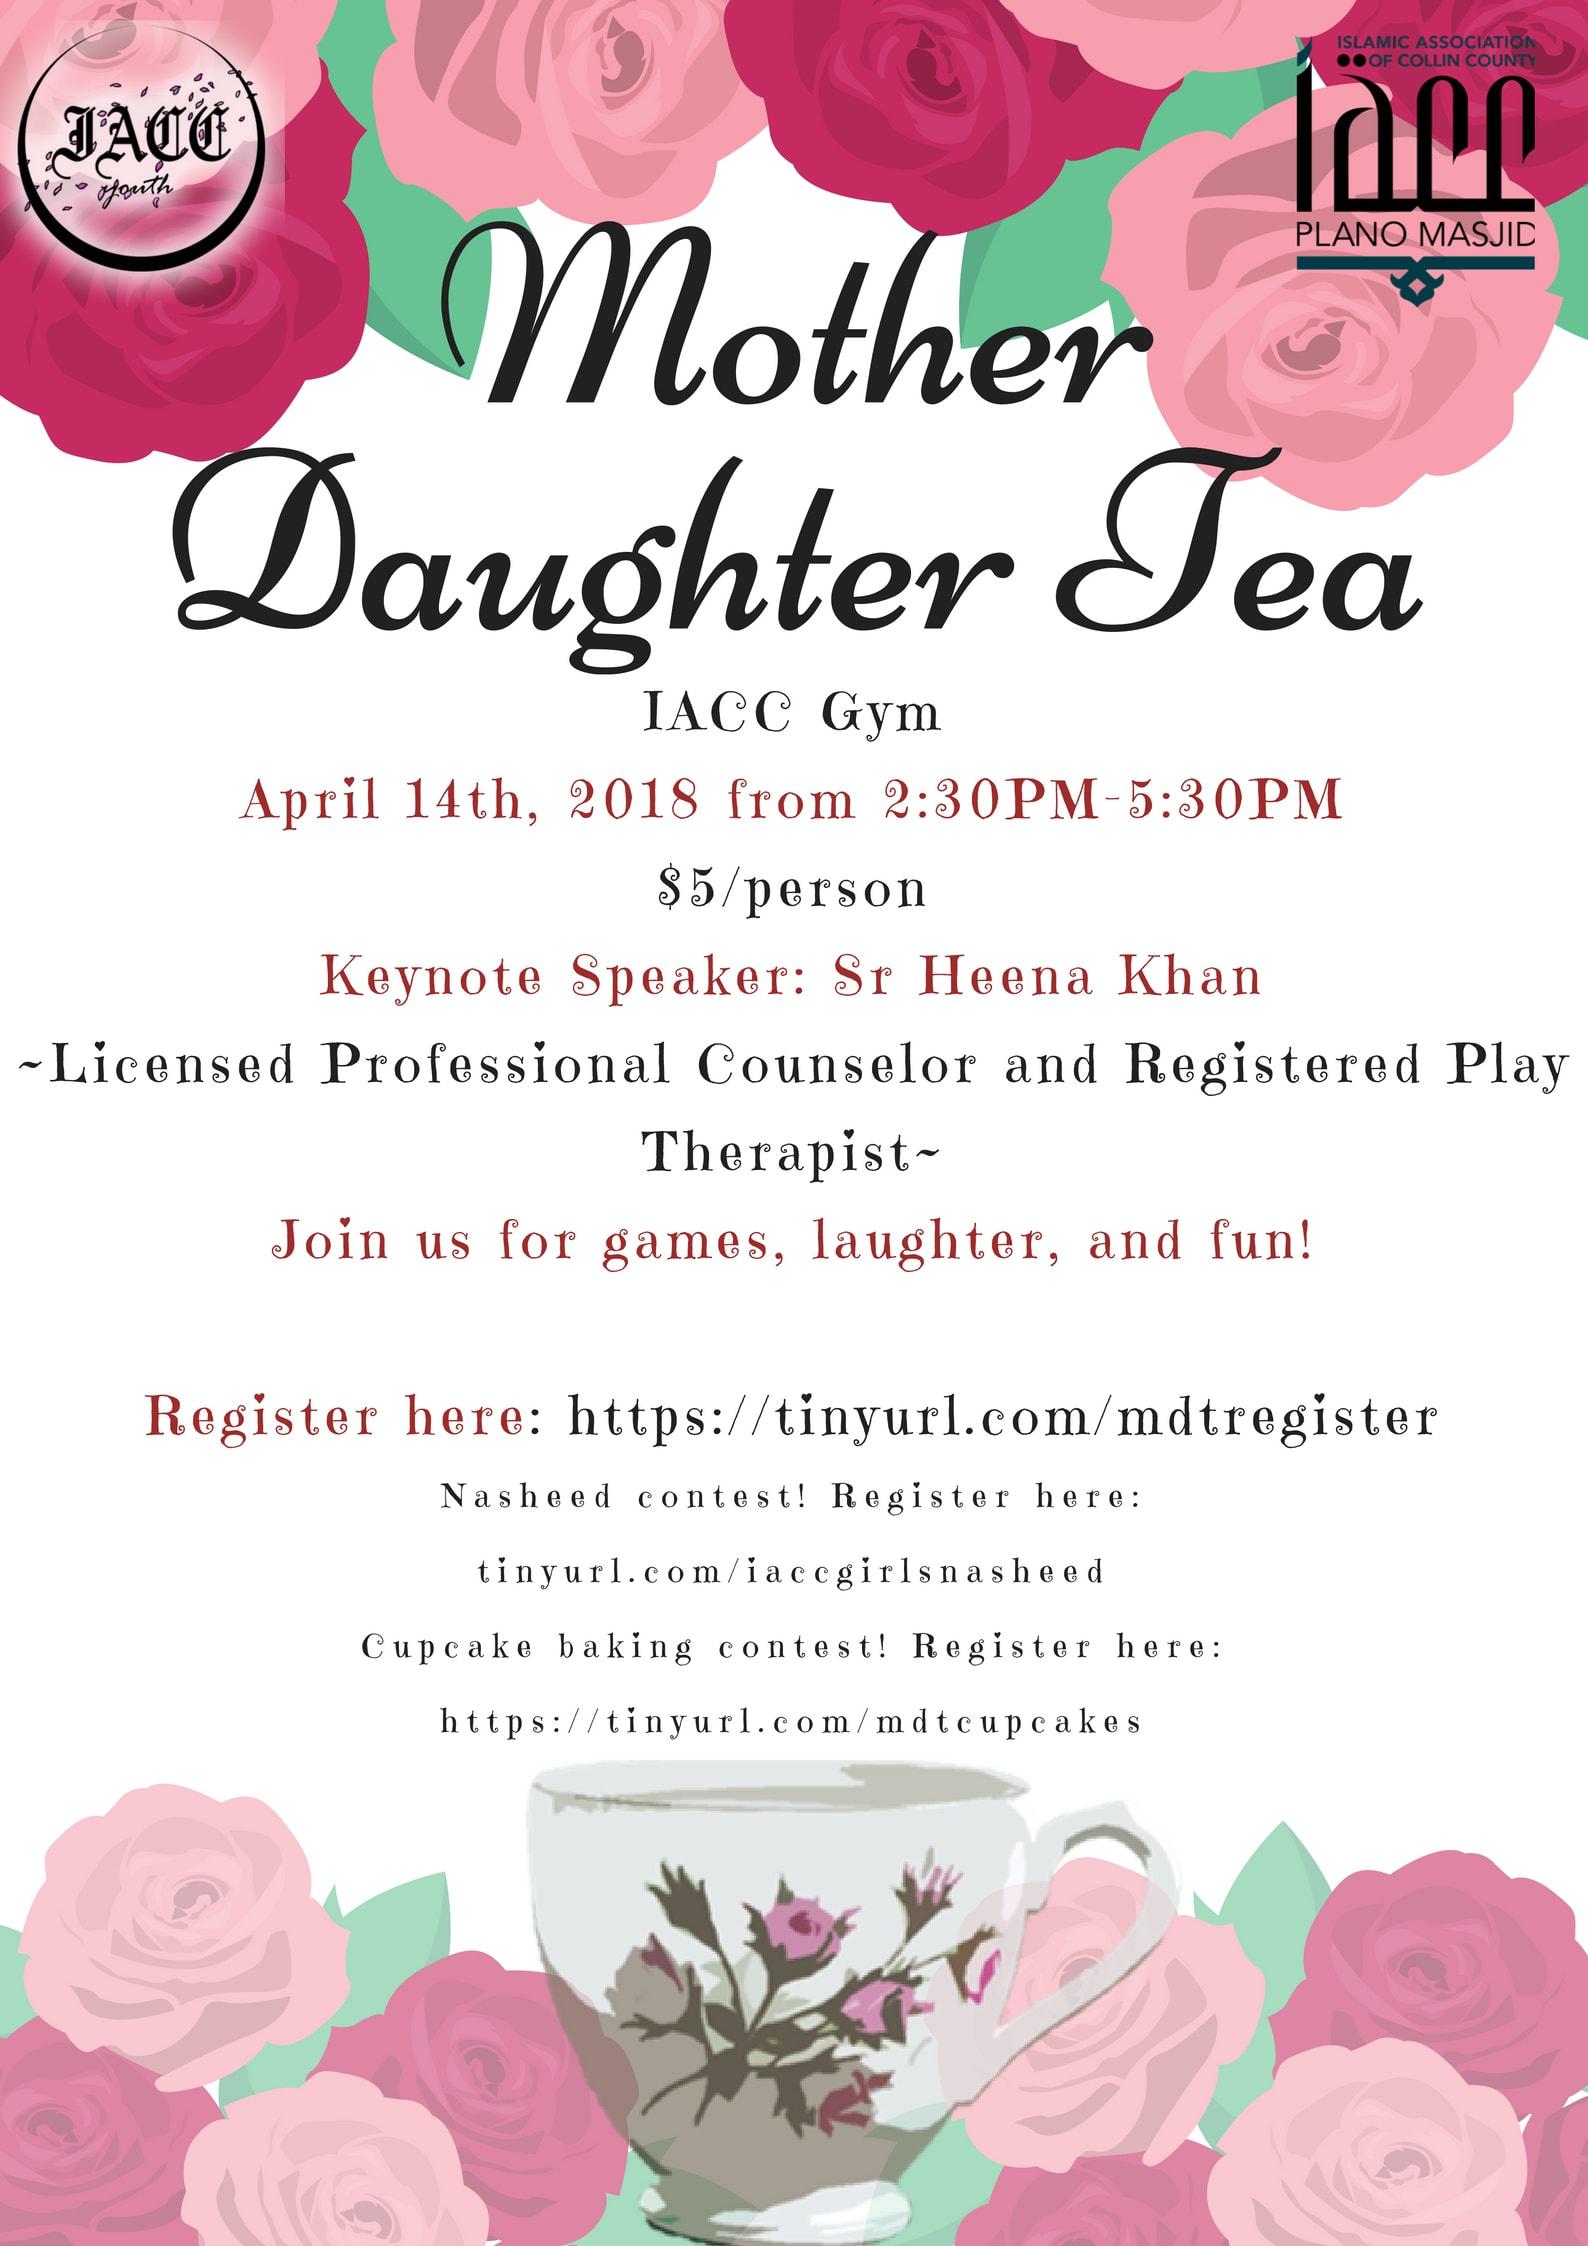 Mother Daughter Tea Plano Masjid